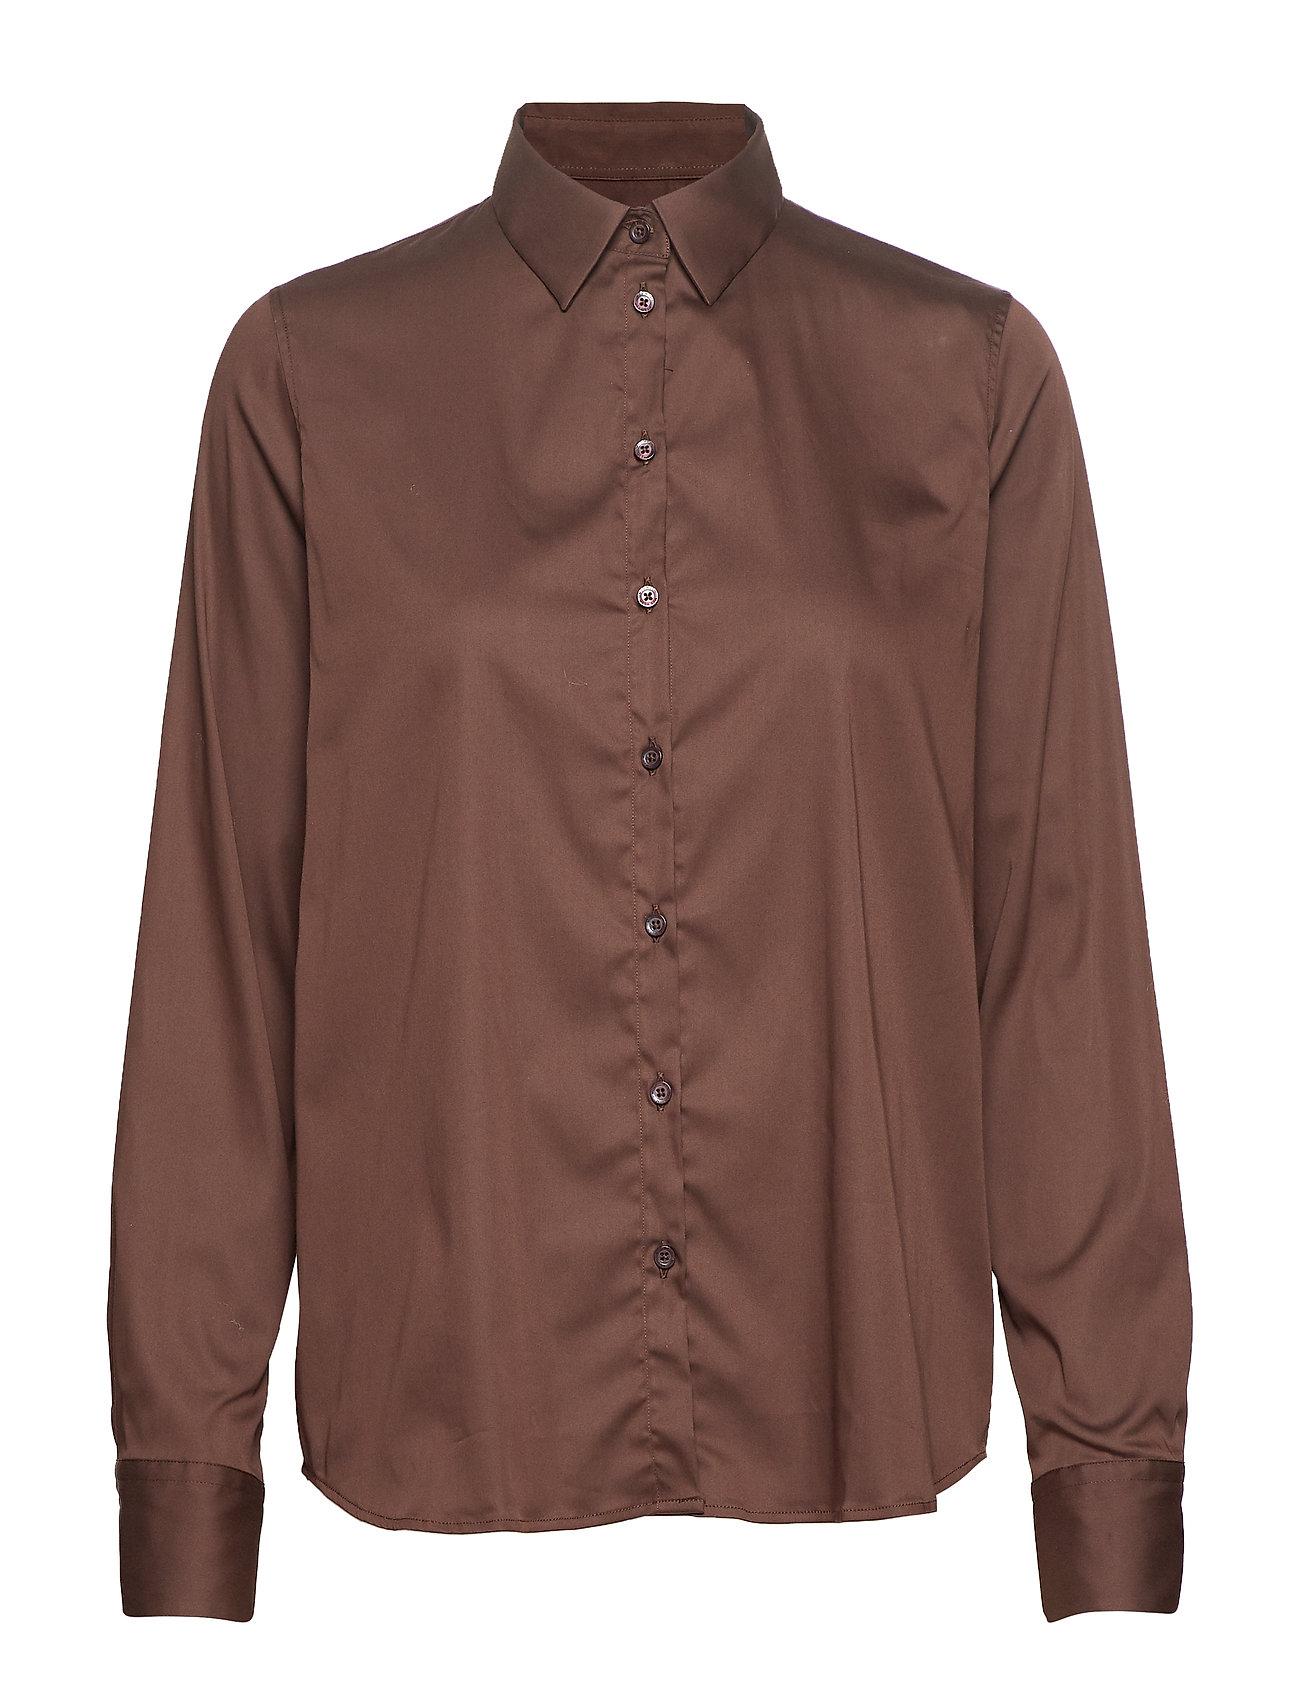 MOS MOSH Martina Shirt - COFFEE BEAN